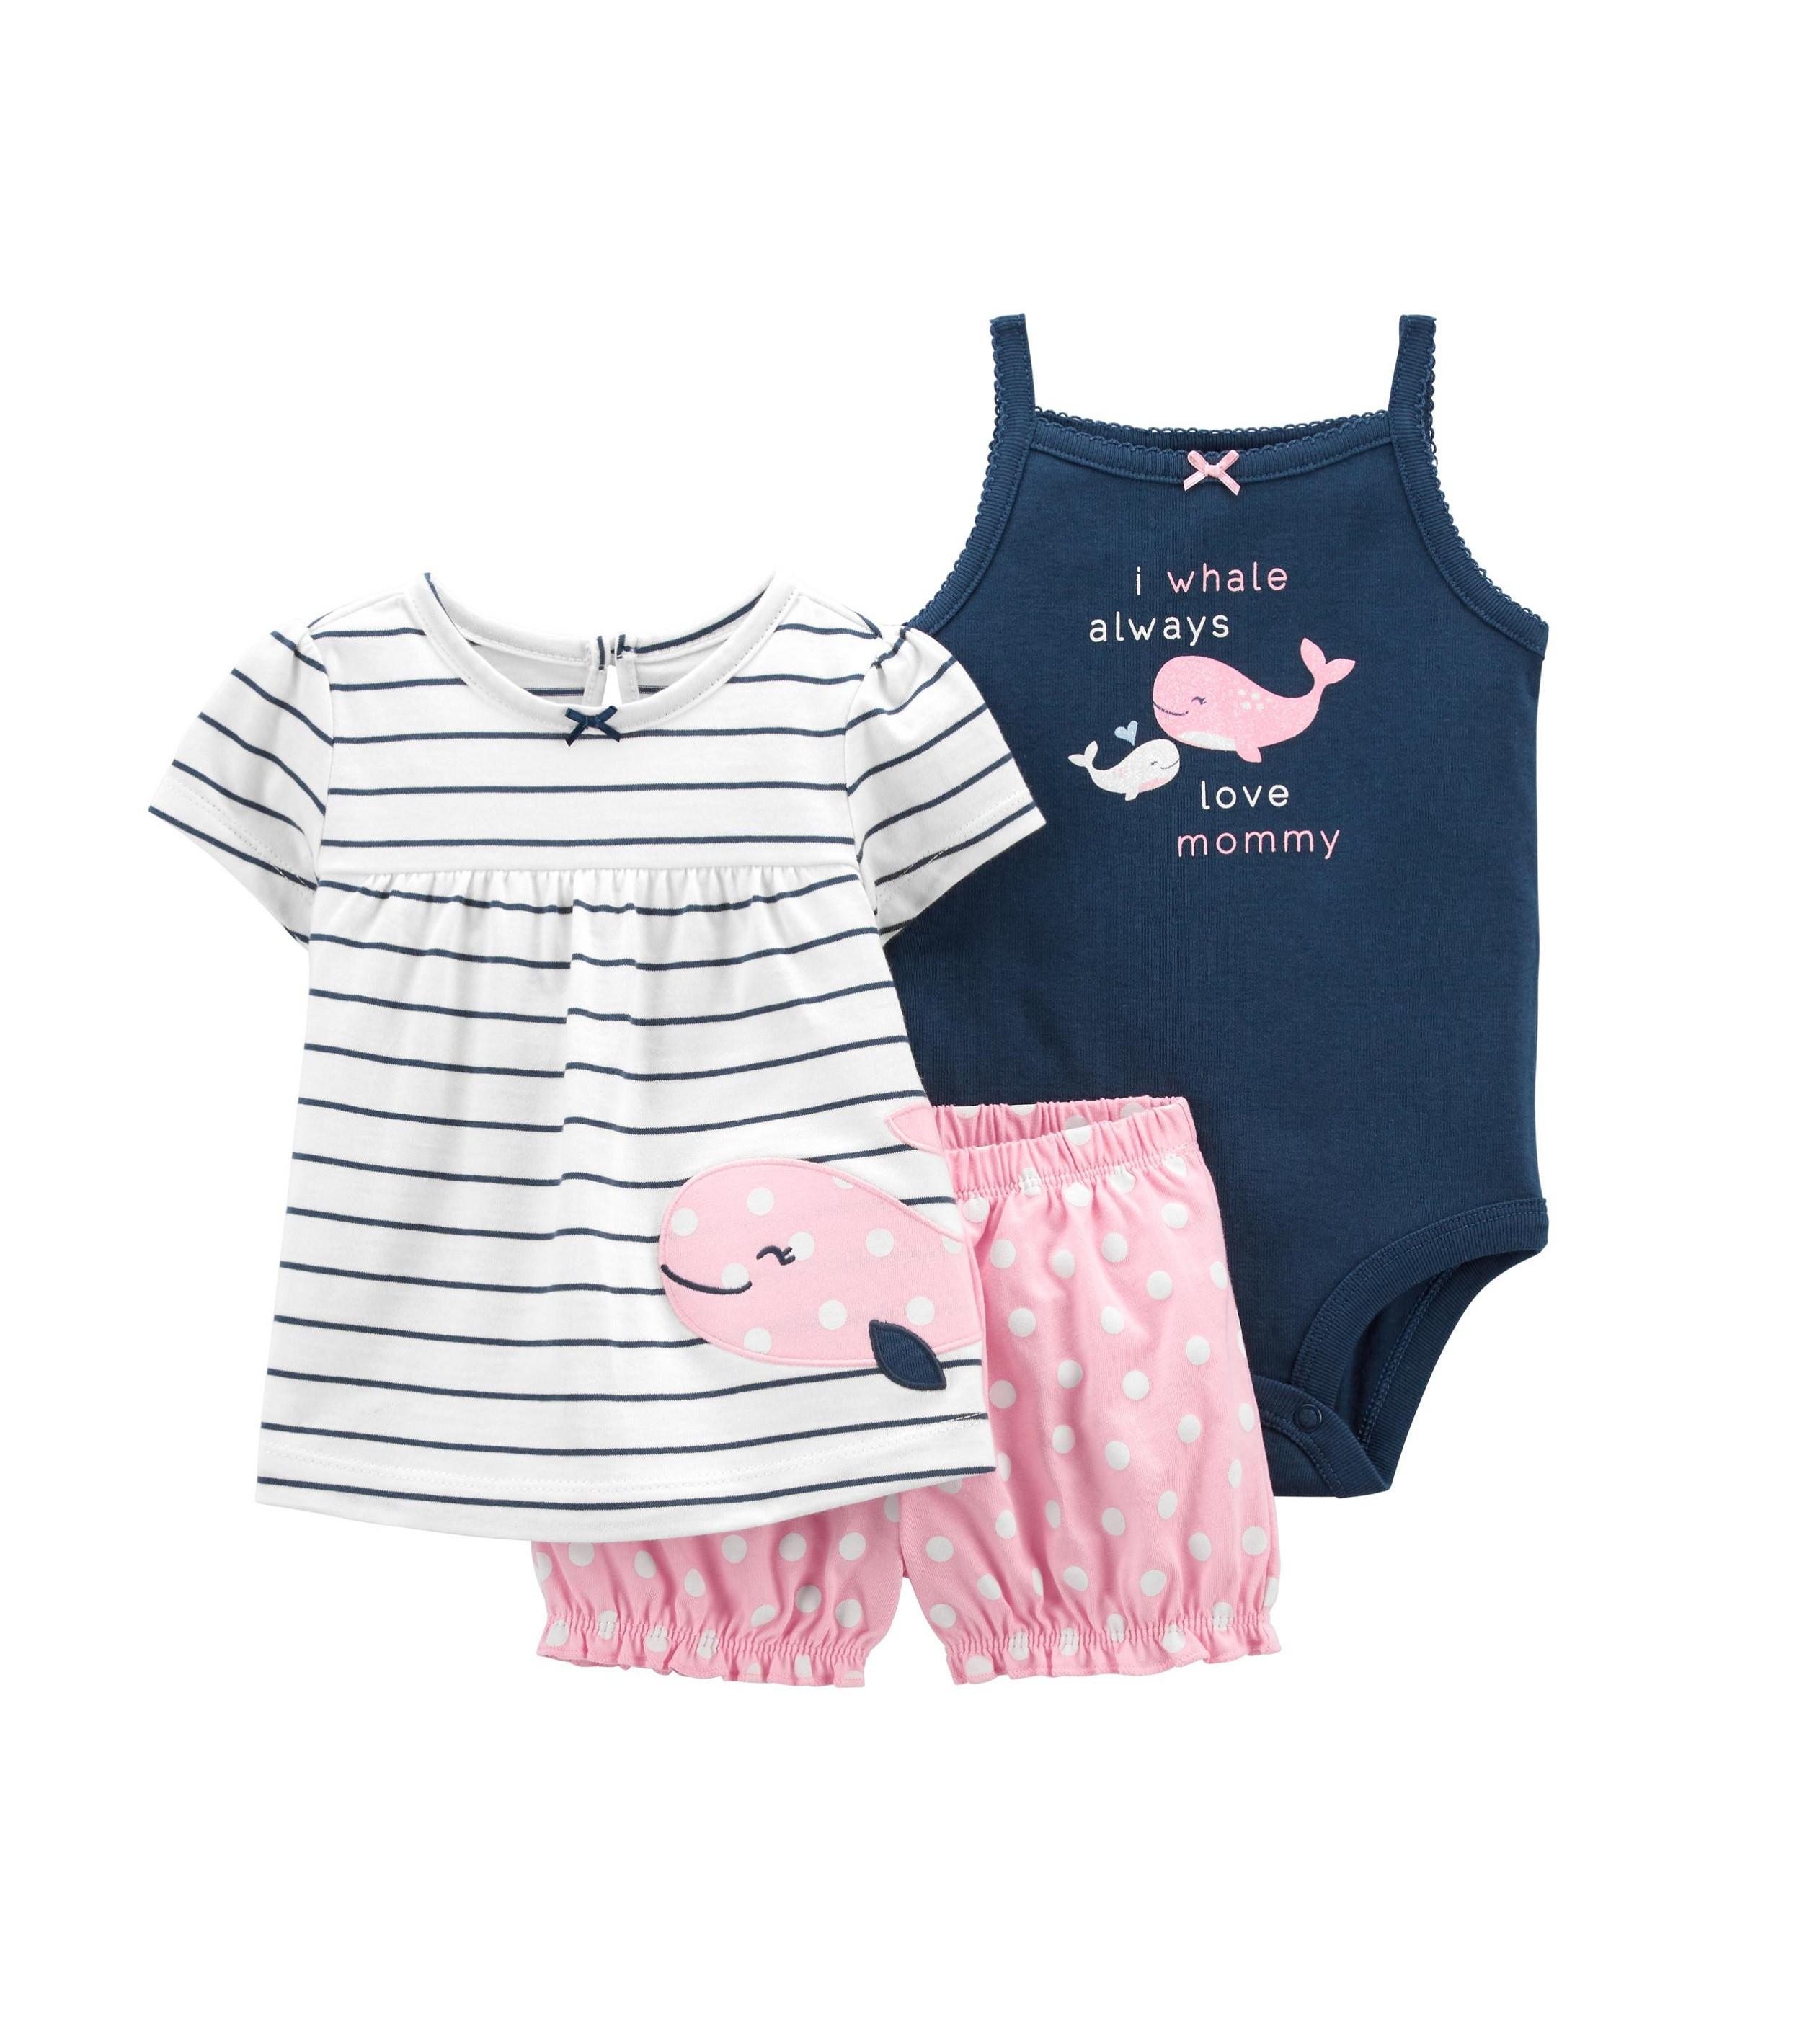 Купити Костюм 3в1 Carters I Whale Always Love Mommy - фото 1